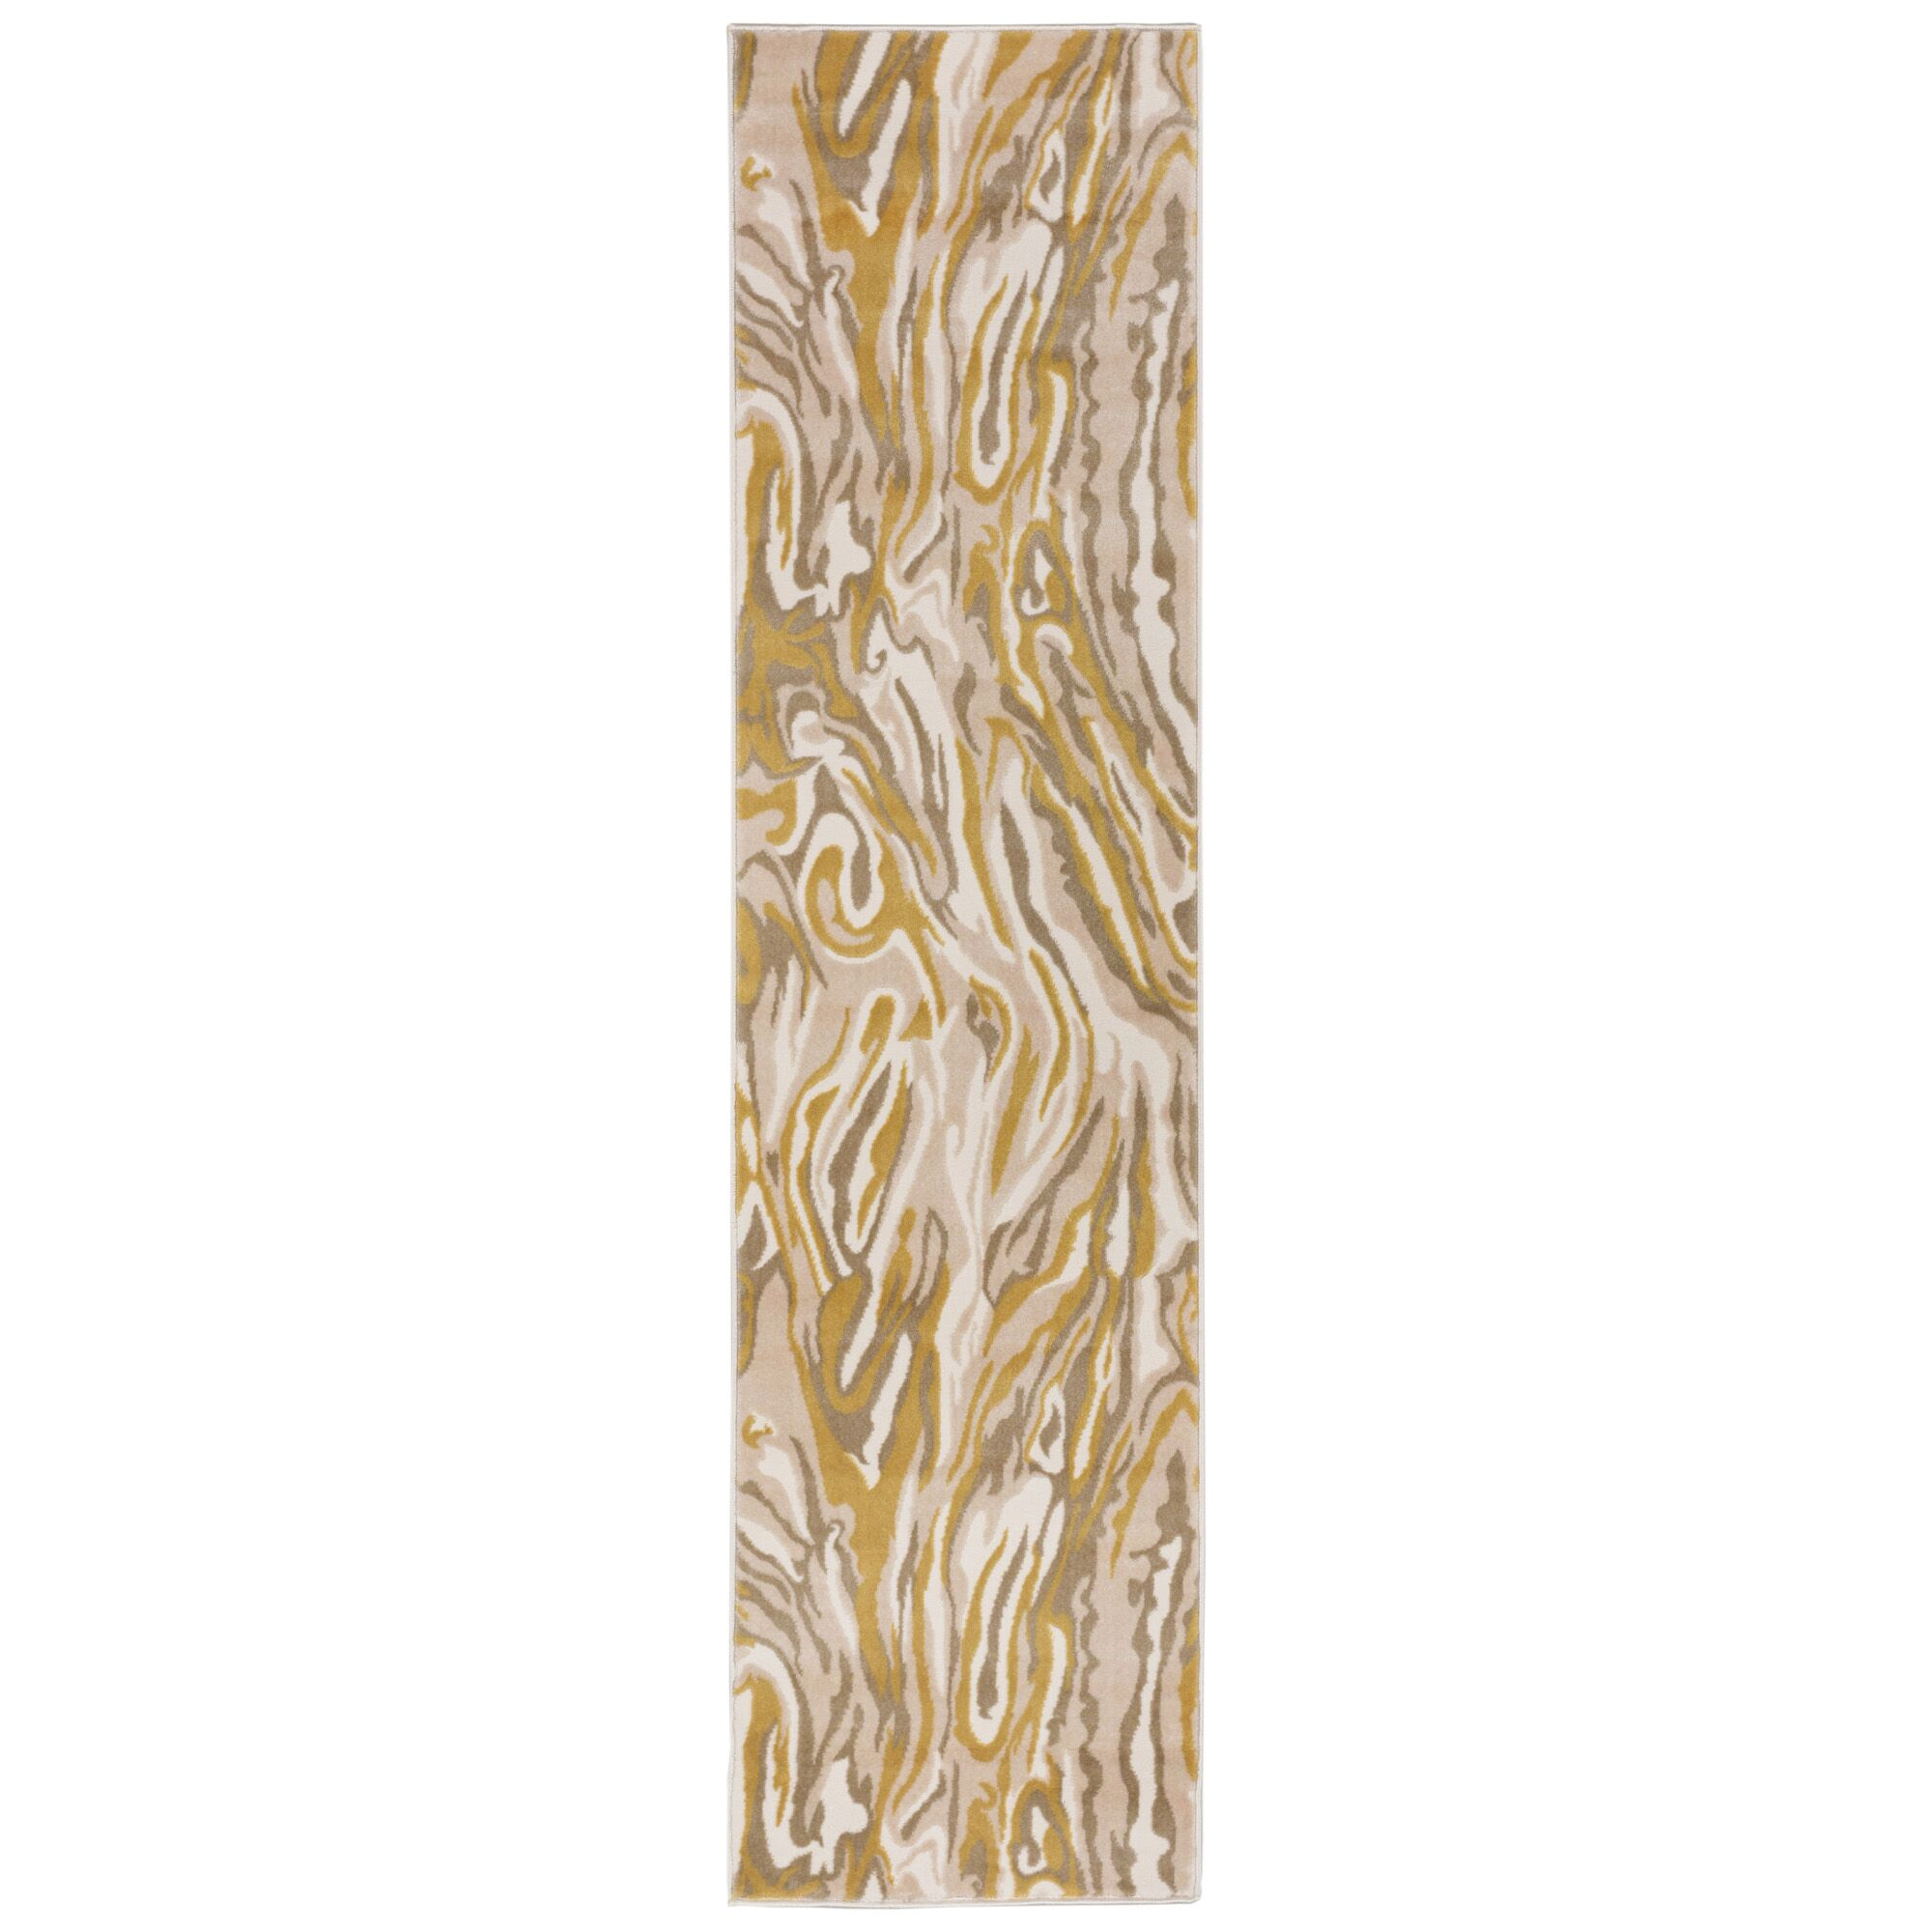 Kari Marble Yellow/Beige Area Rug Rug Size: Runner 1'11